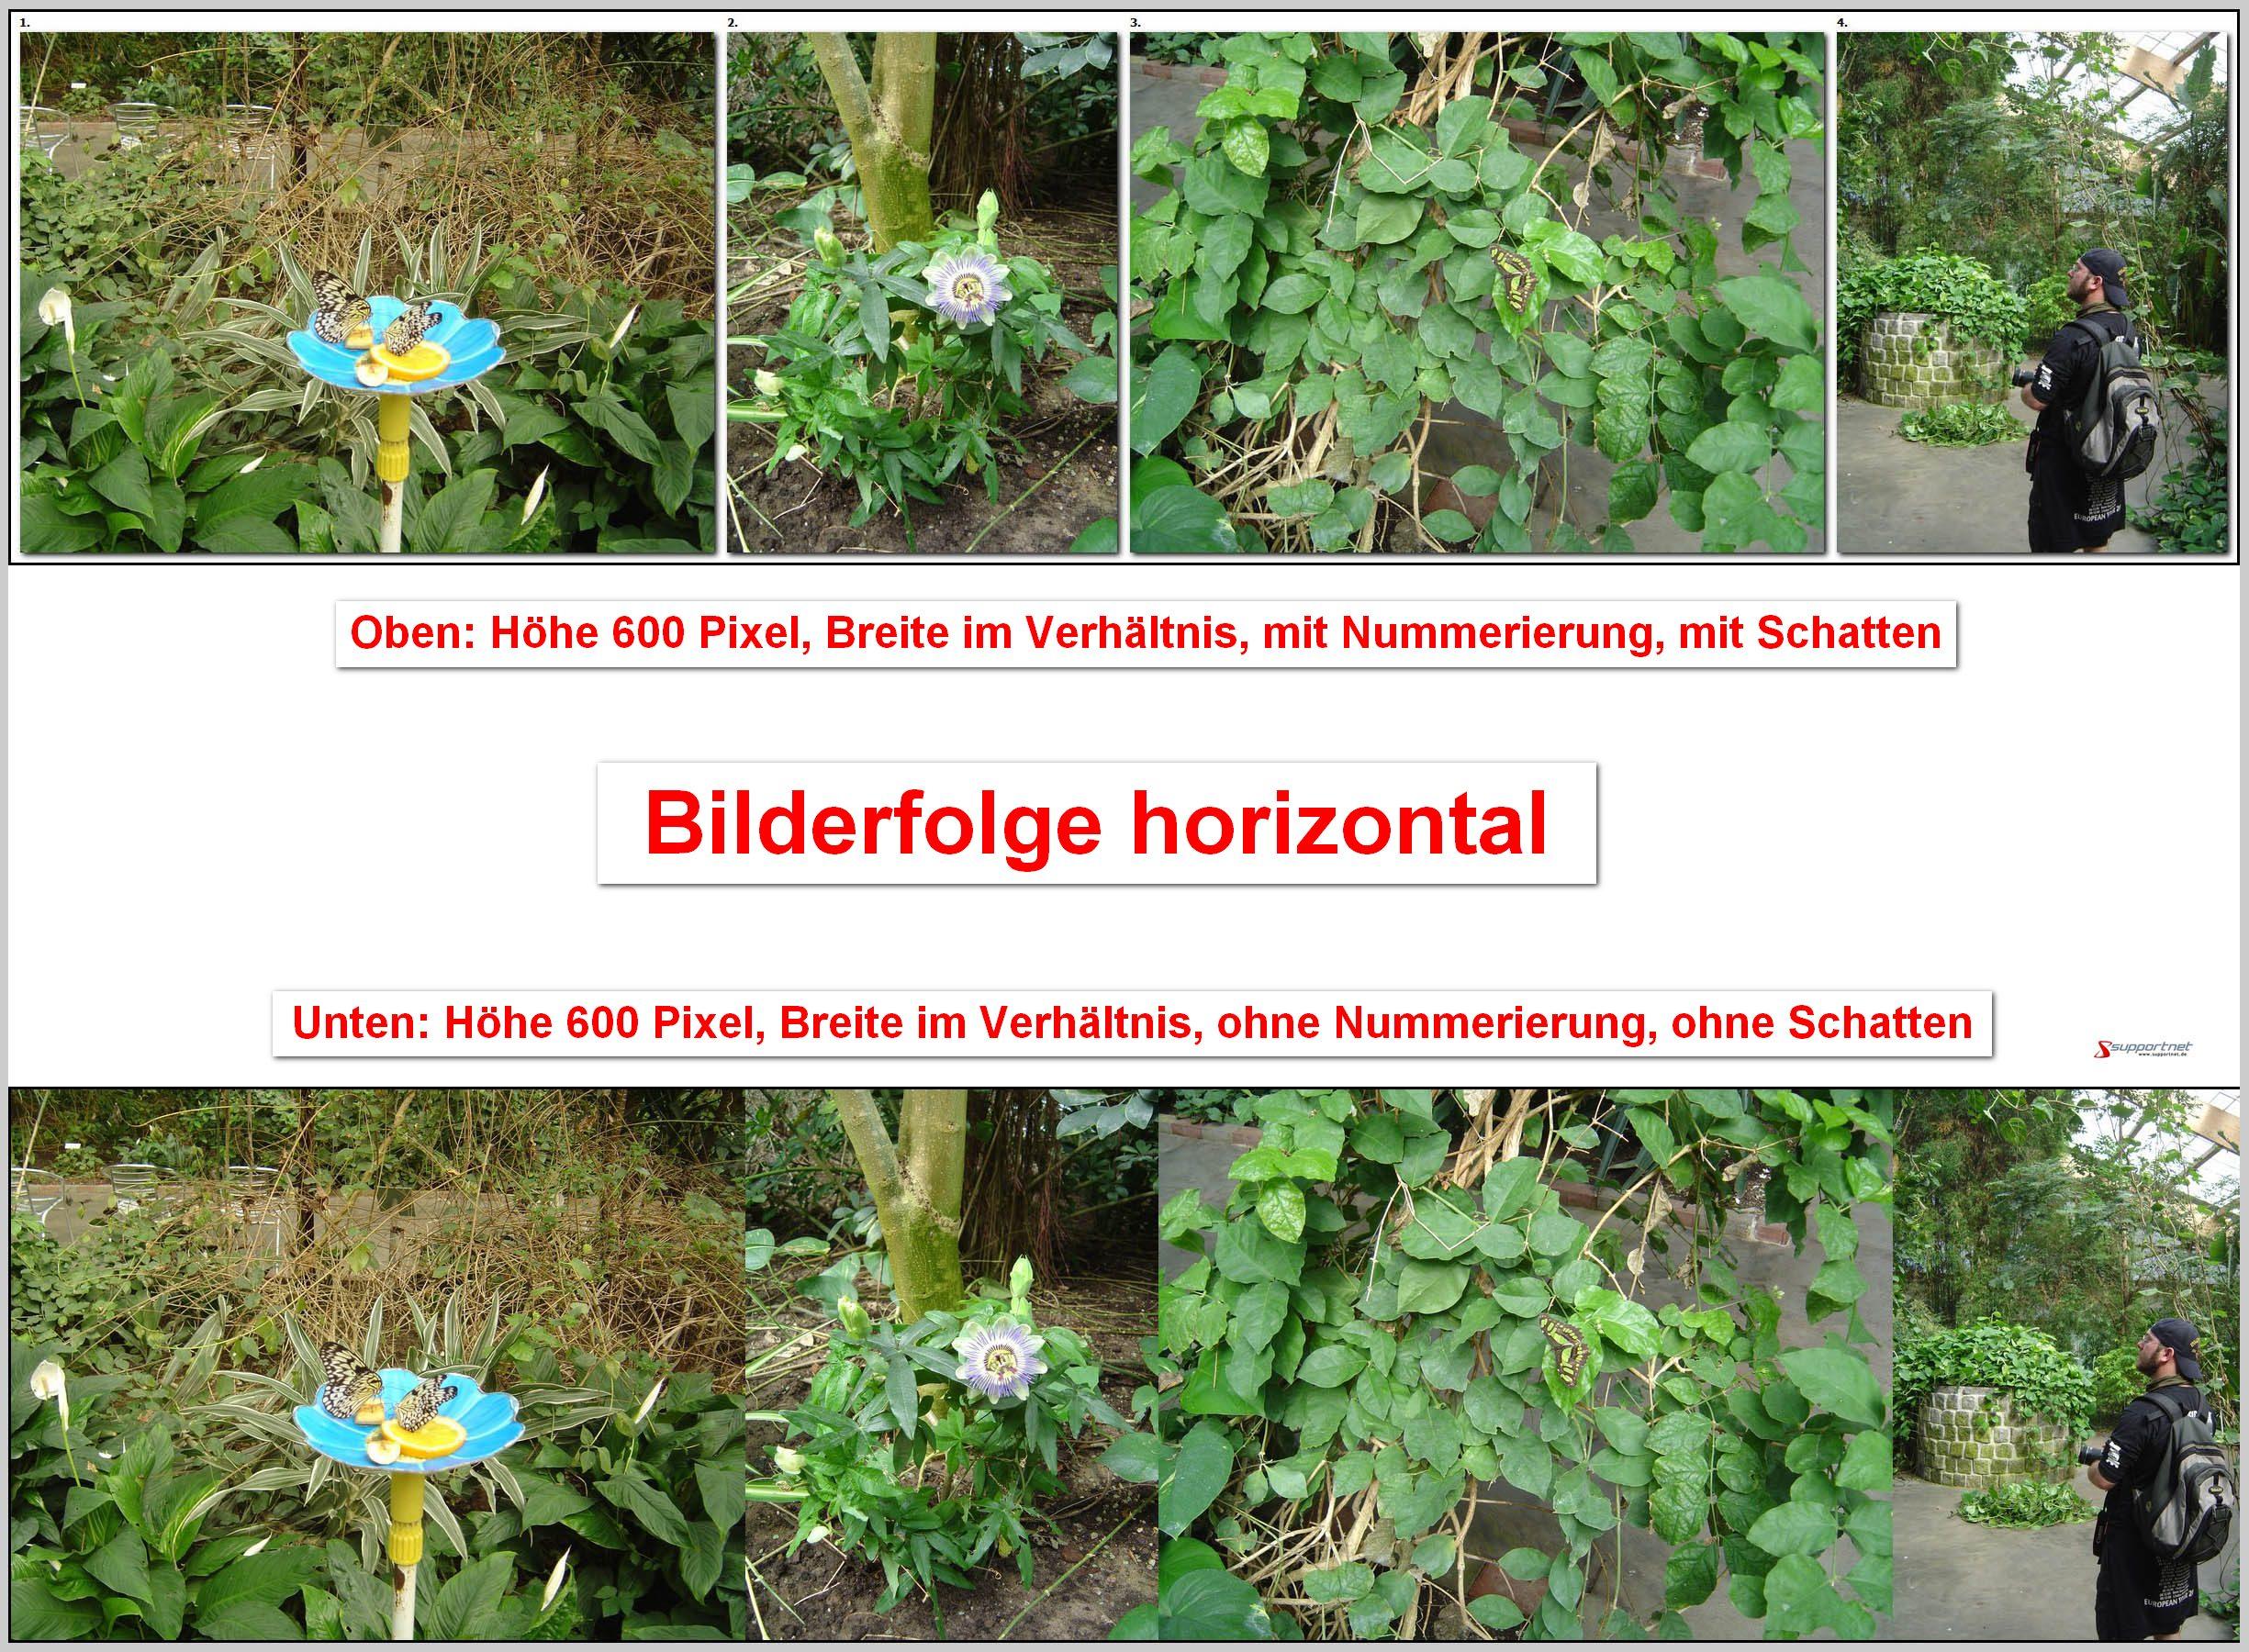 02-FastStone-Image-Viewer-Bilderfolge-horizontal-80.jpg